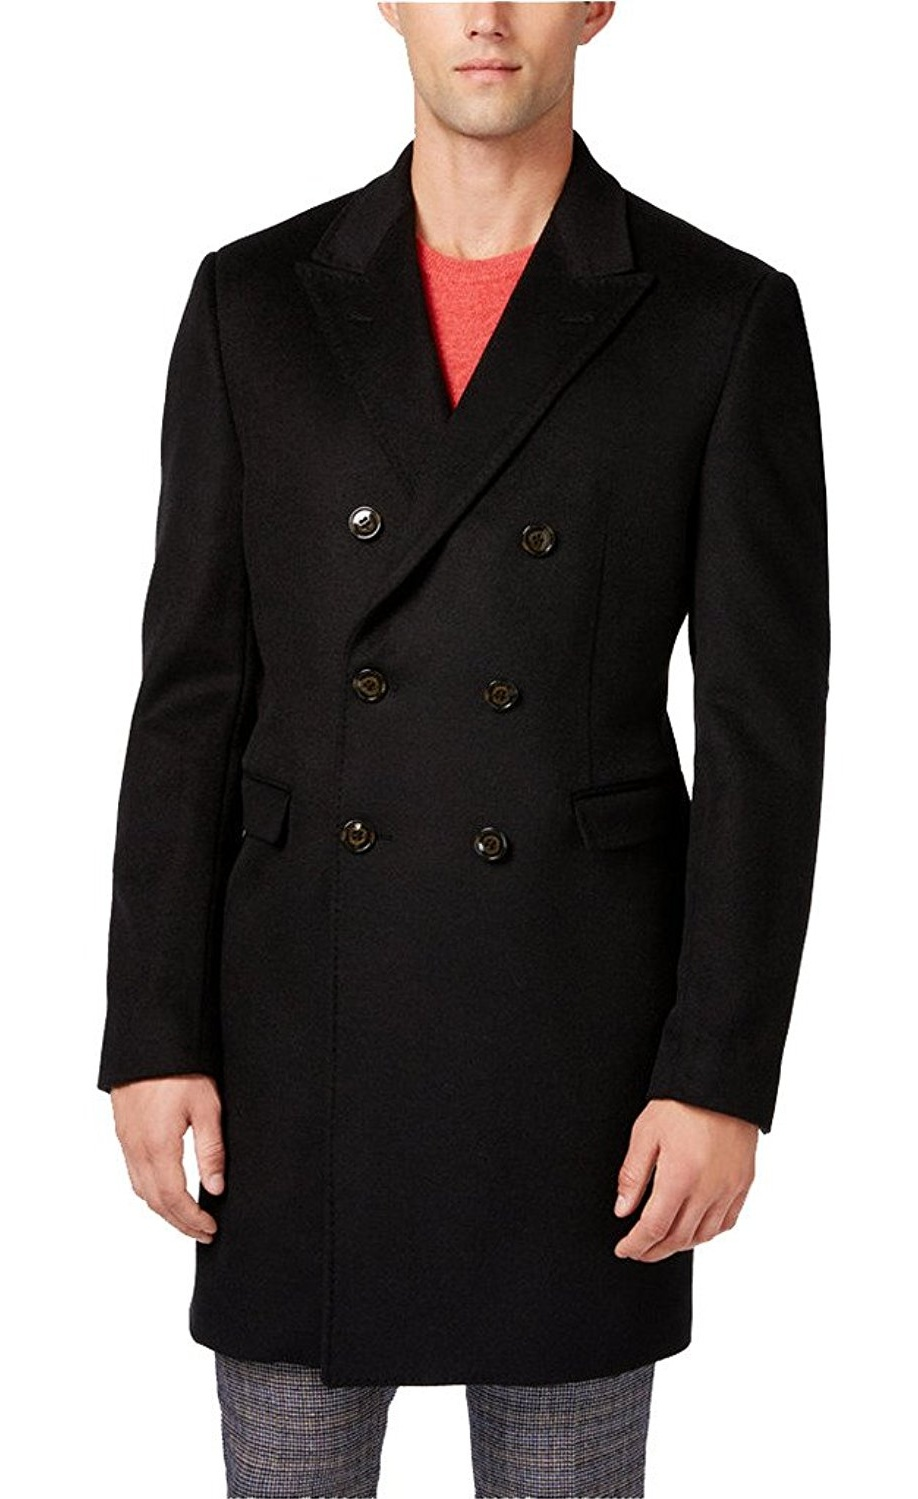 Ralph Lauren Men's Lawrenceville Topcoat Double-Breasted Wool Blend Solid Overcoat by